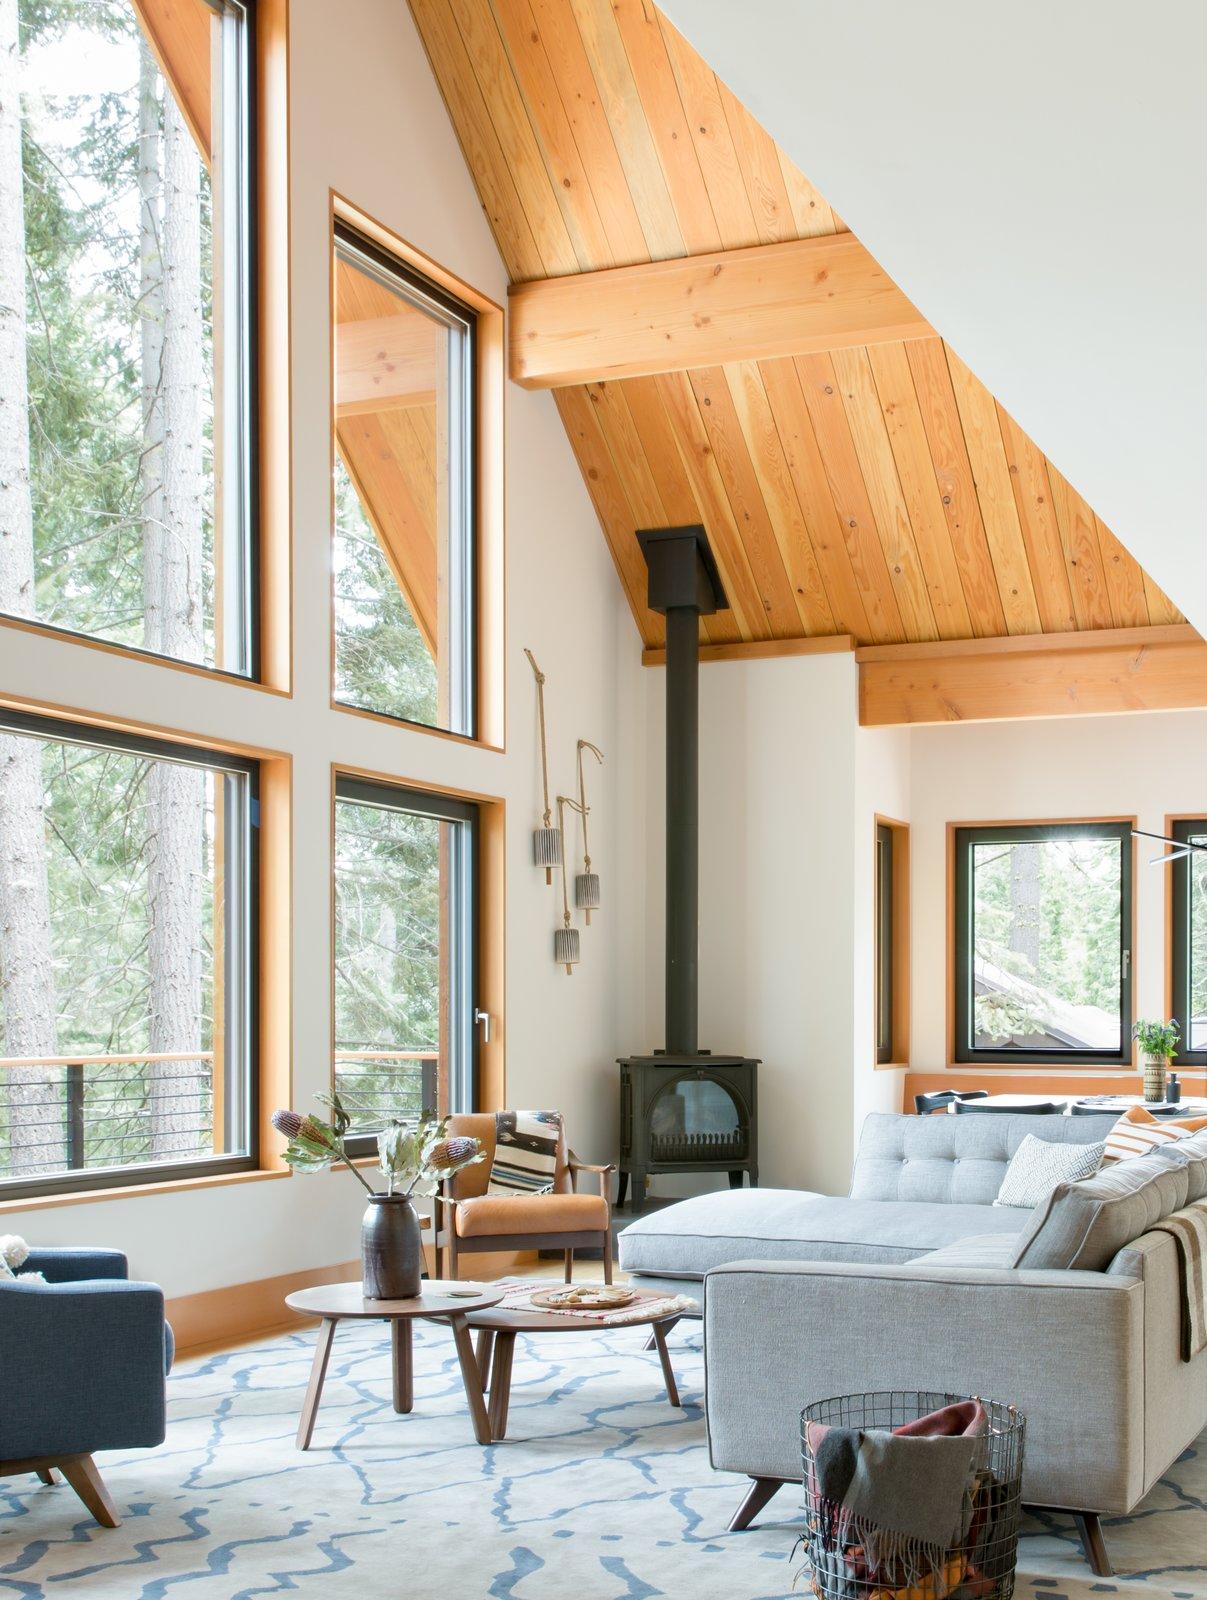 Living Room, Sectional, Corner Fireplace, Chair, Rug Floor, Light Hardwood Floor, and Wood Burning Fireplace  Woodsy Tahoe Cabin by Regan Baker Design